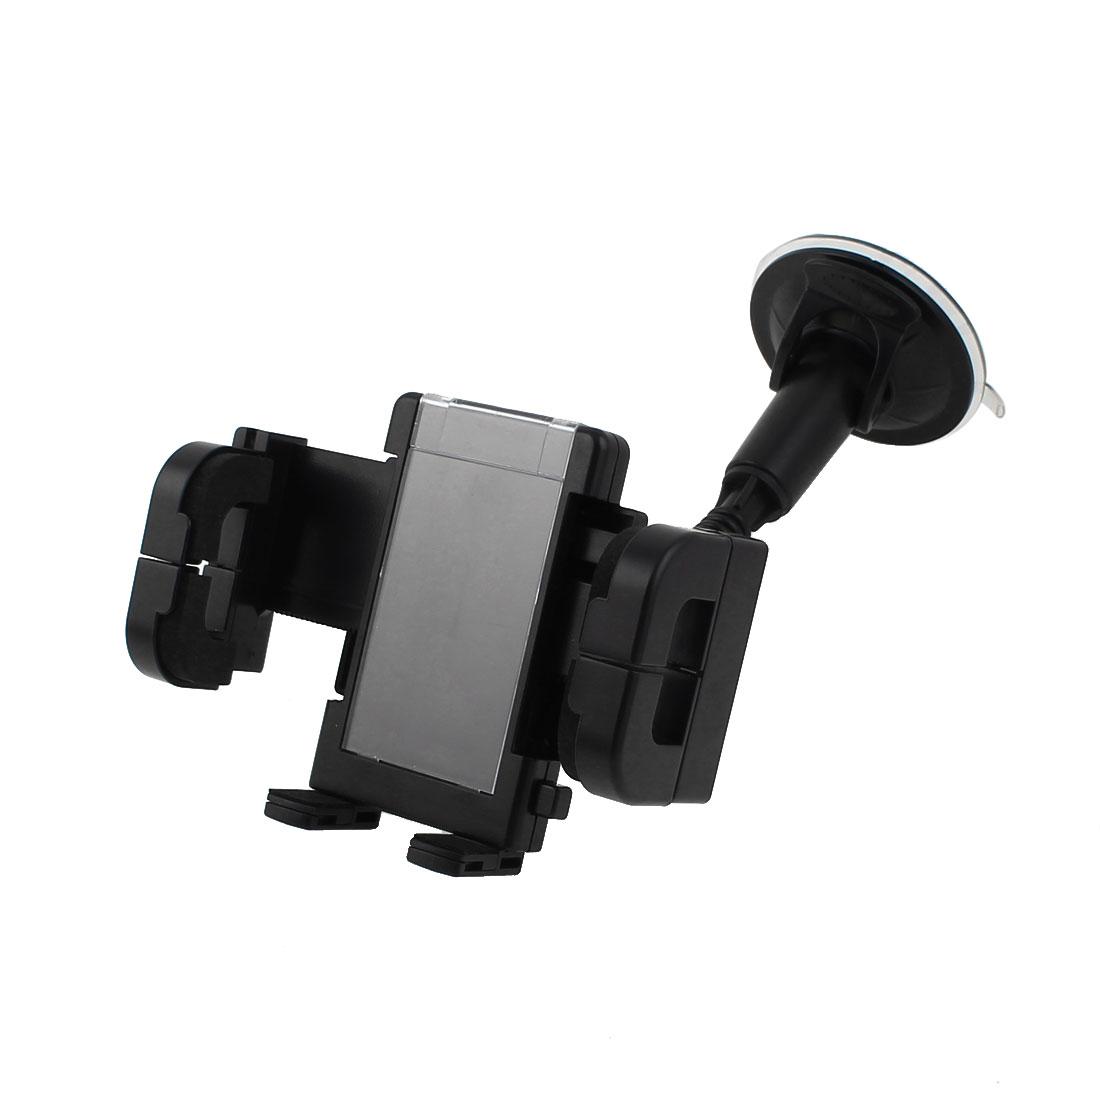 Car Universal Windshield Mount Cradle Holder for Mobile phone GPS